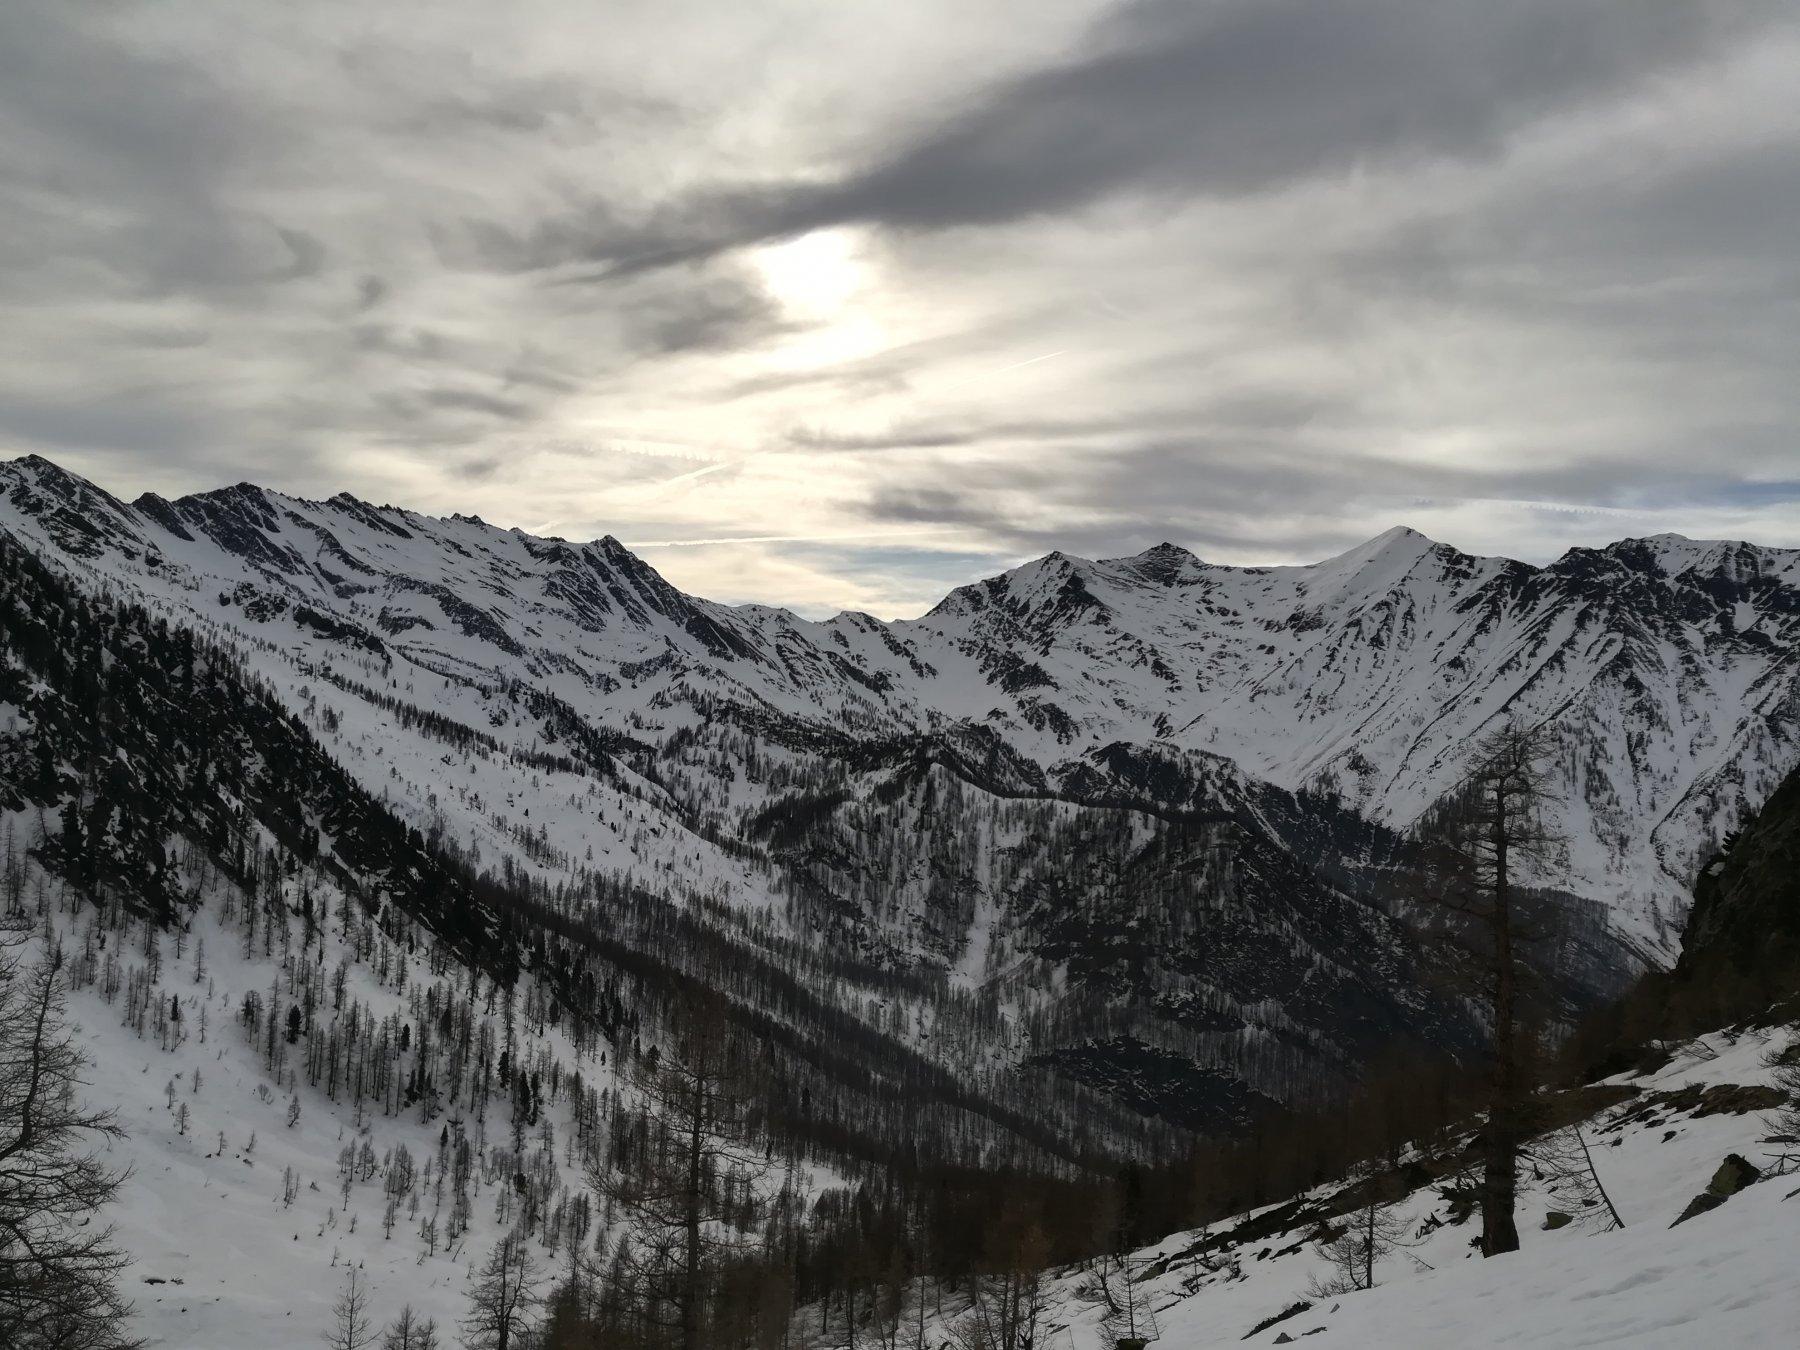 Testata della Val Germanasca